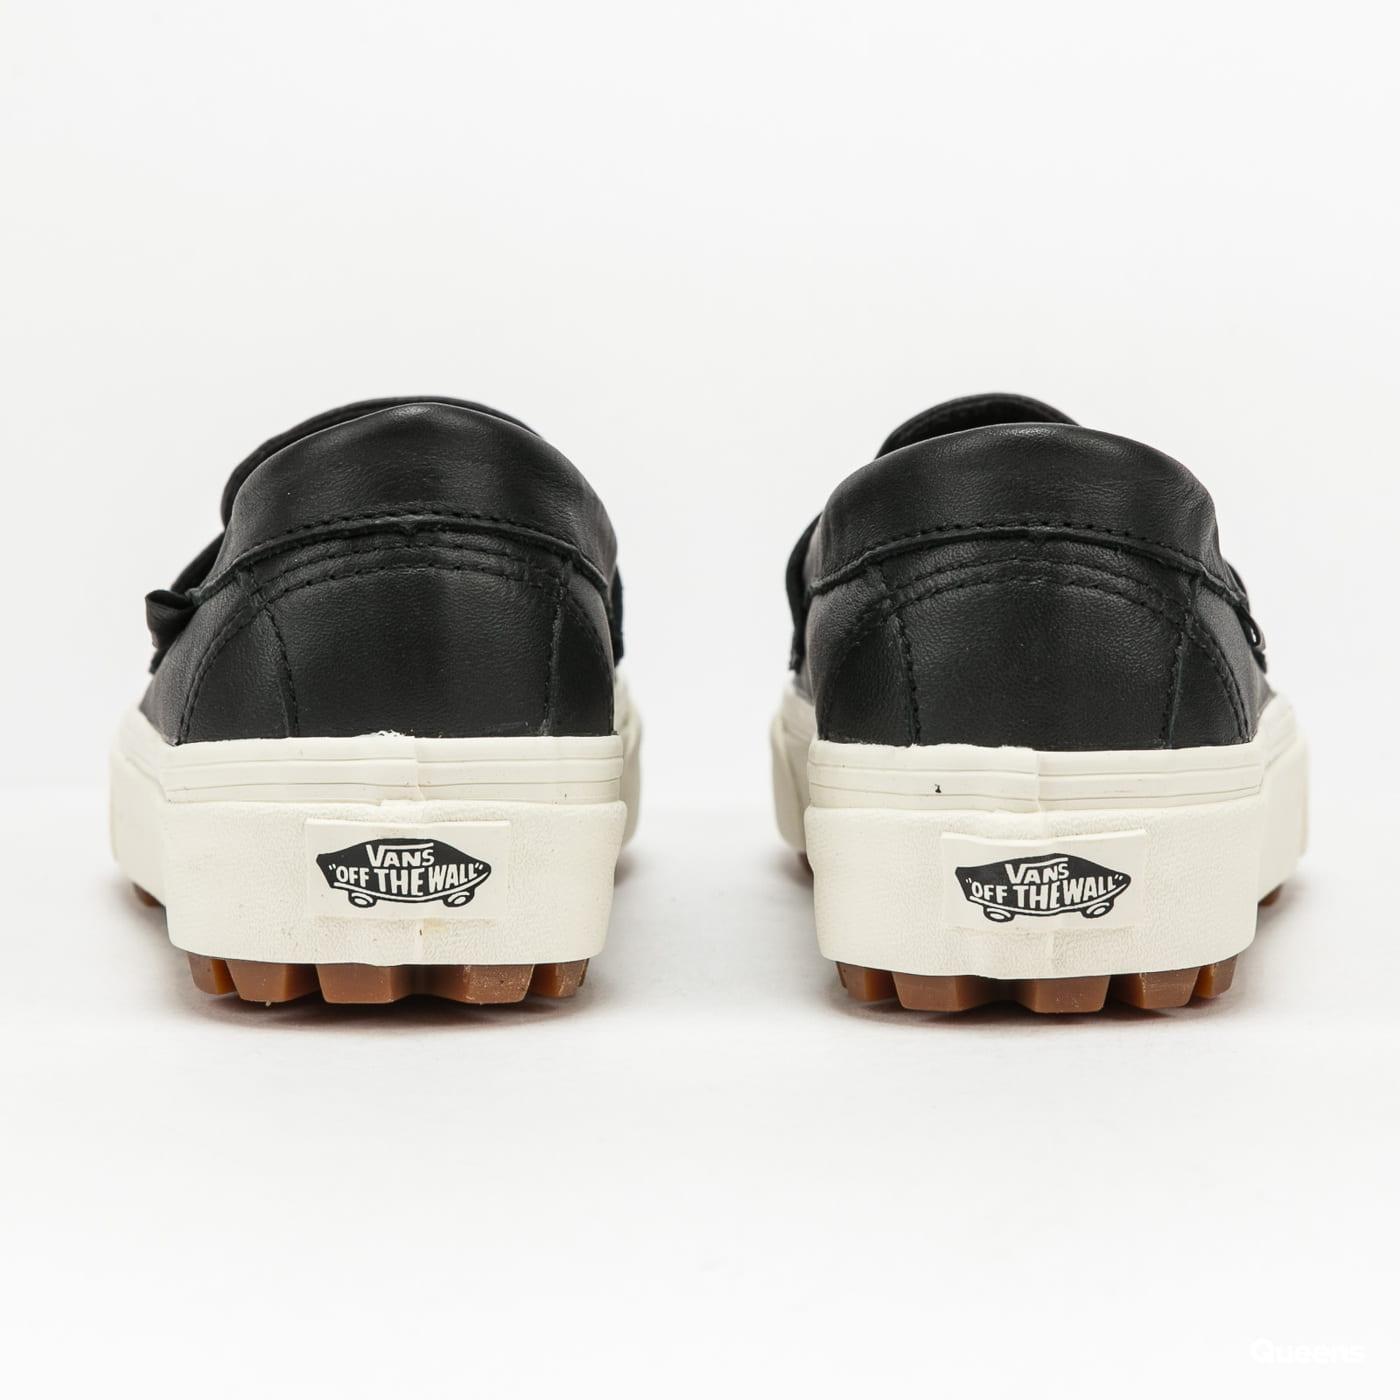 Vans Style 53 (hardware) western / leather